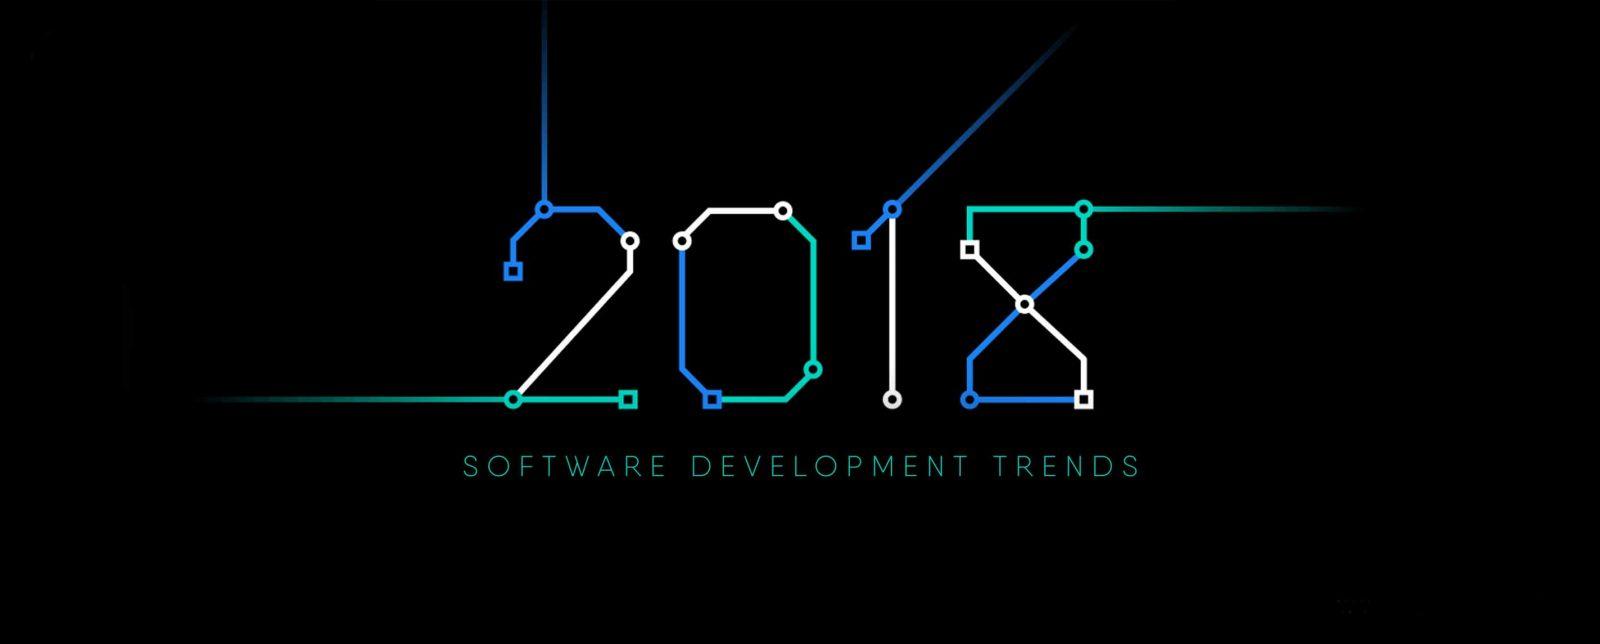 software-development-trends-2018